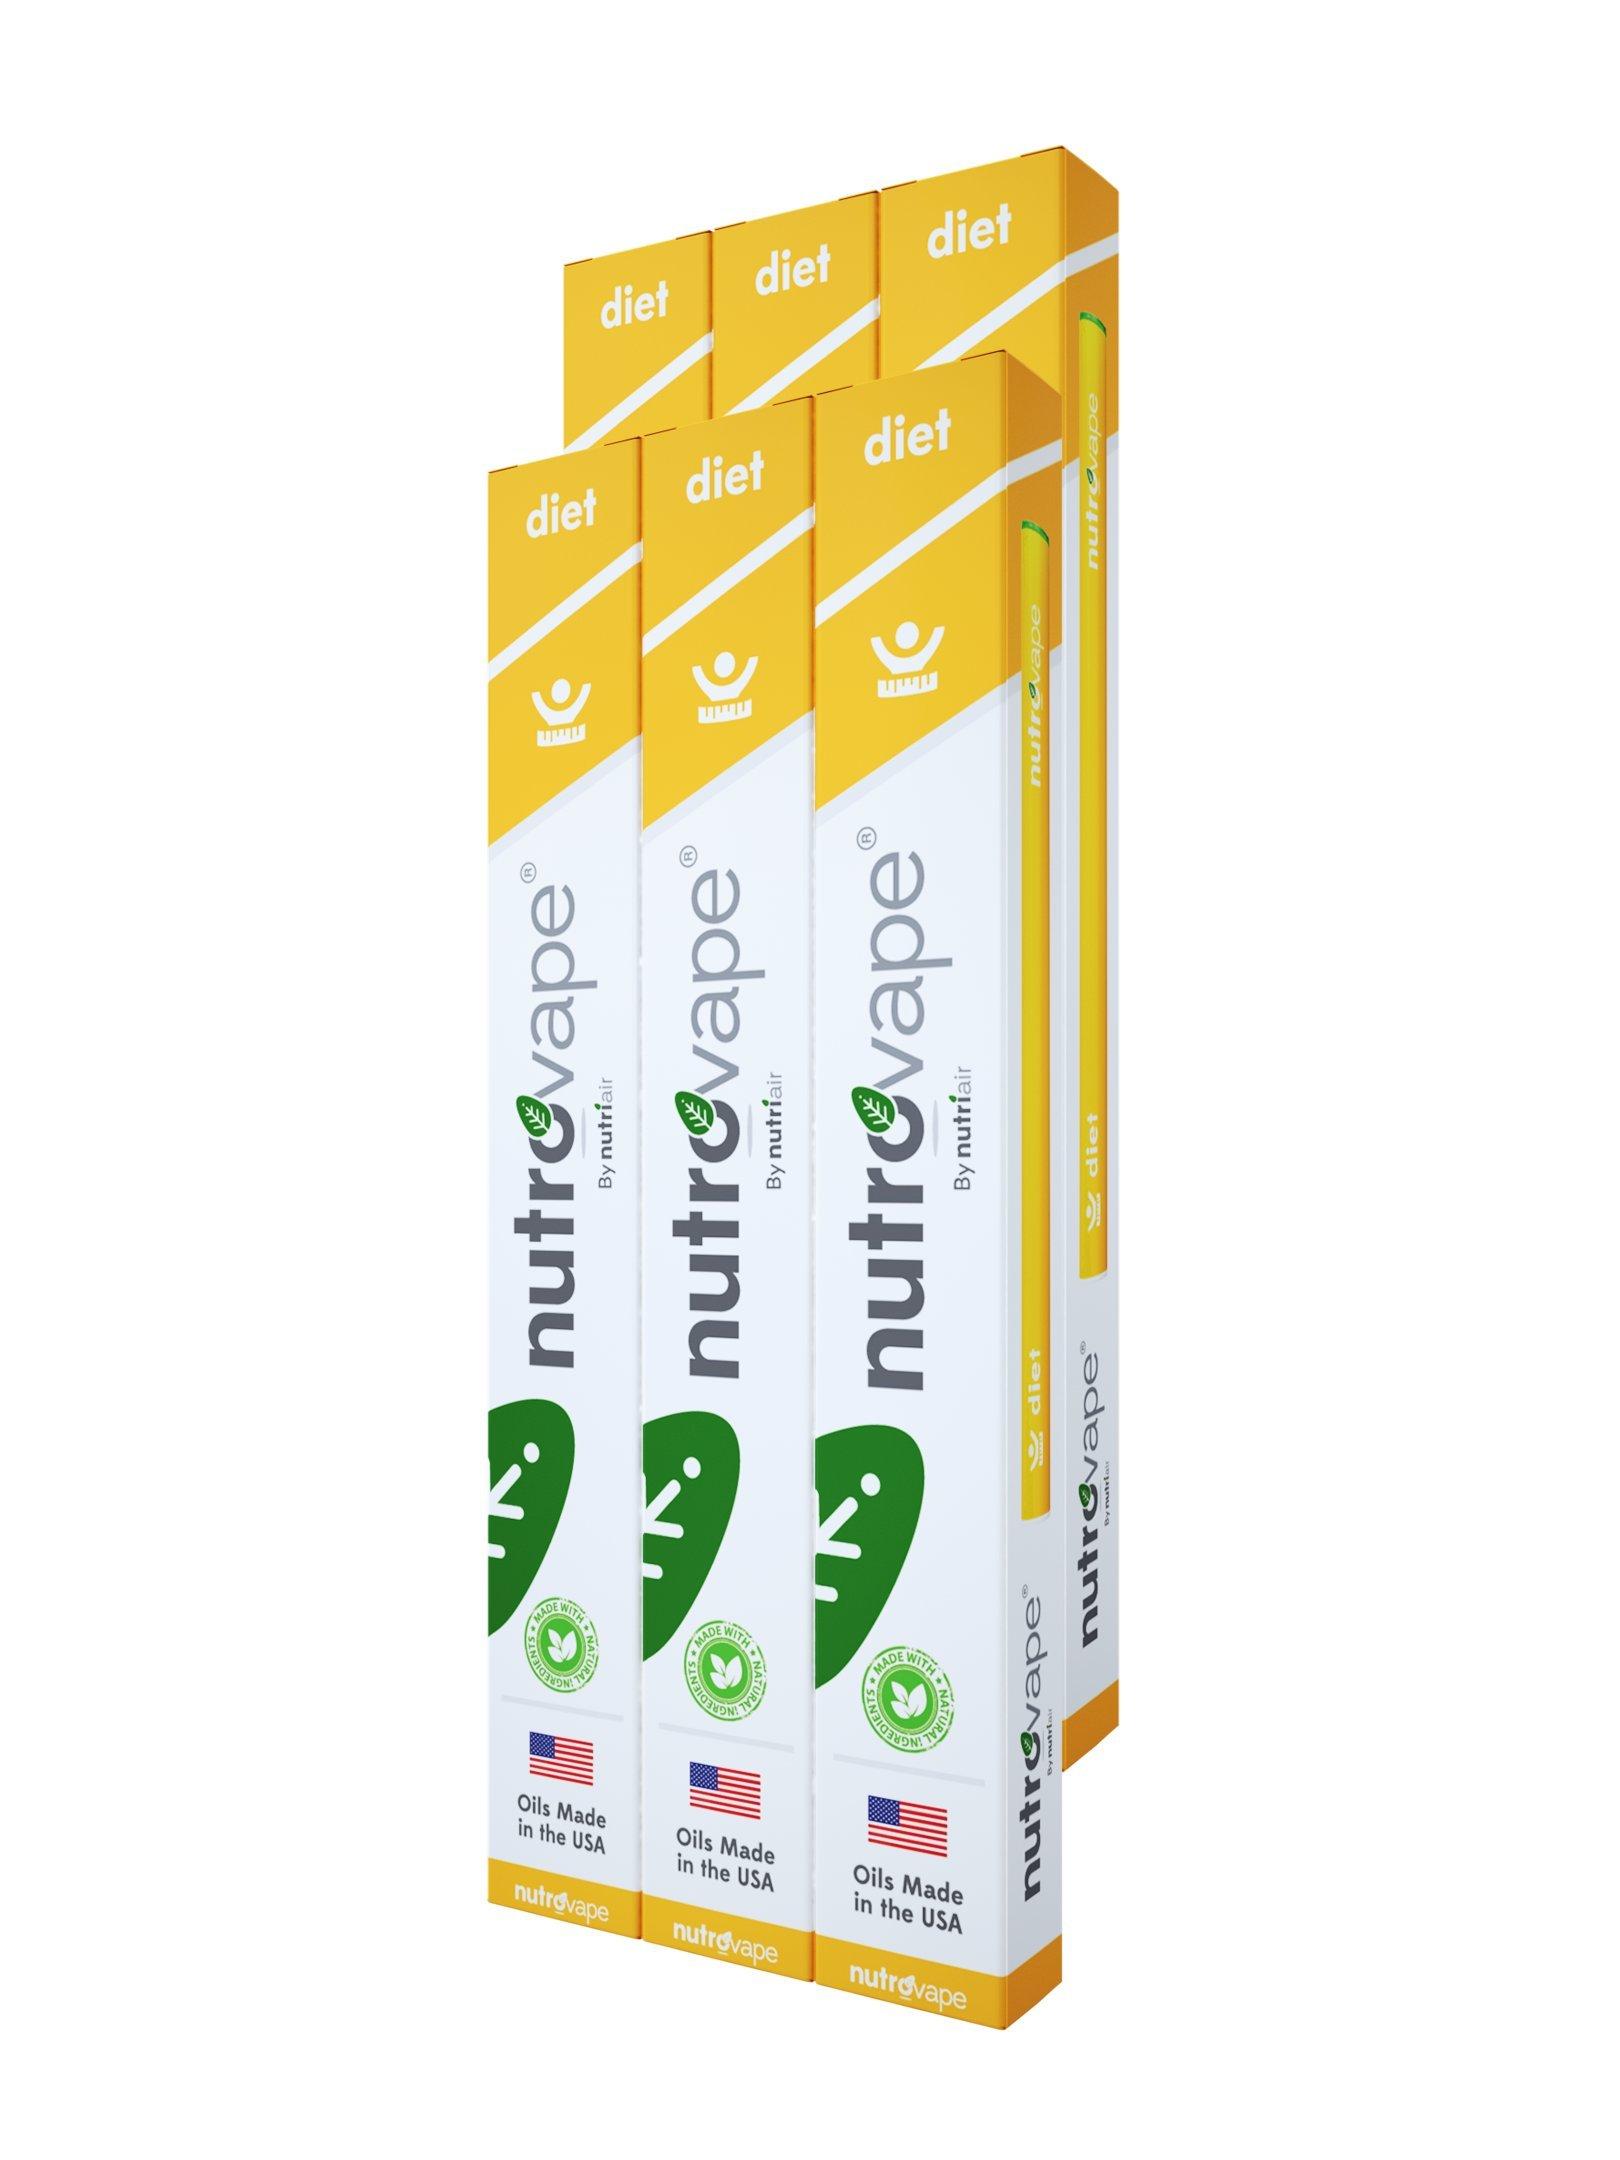 Nutrovape | World's 1st Diet Inhaler | Hunger Suppressant, Promotes Healthy Weight Loss | Diet Pill Alternative | All Natural Hoodia Gordonni, Garcinia Gambogia, Green Tea Extract (6)